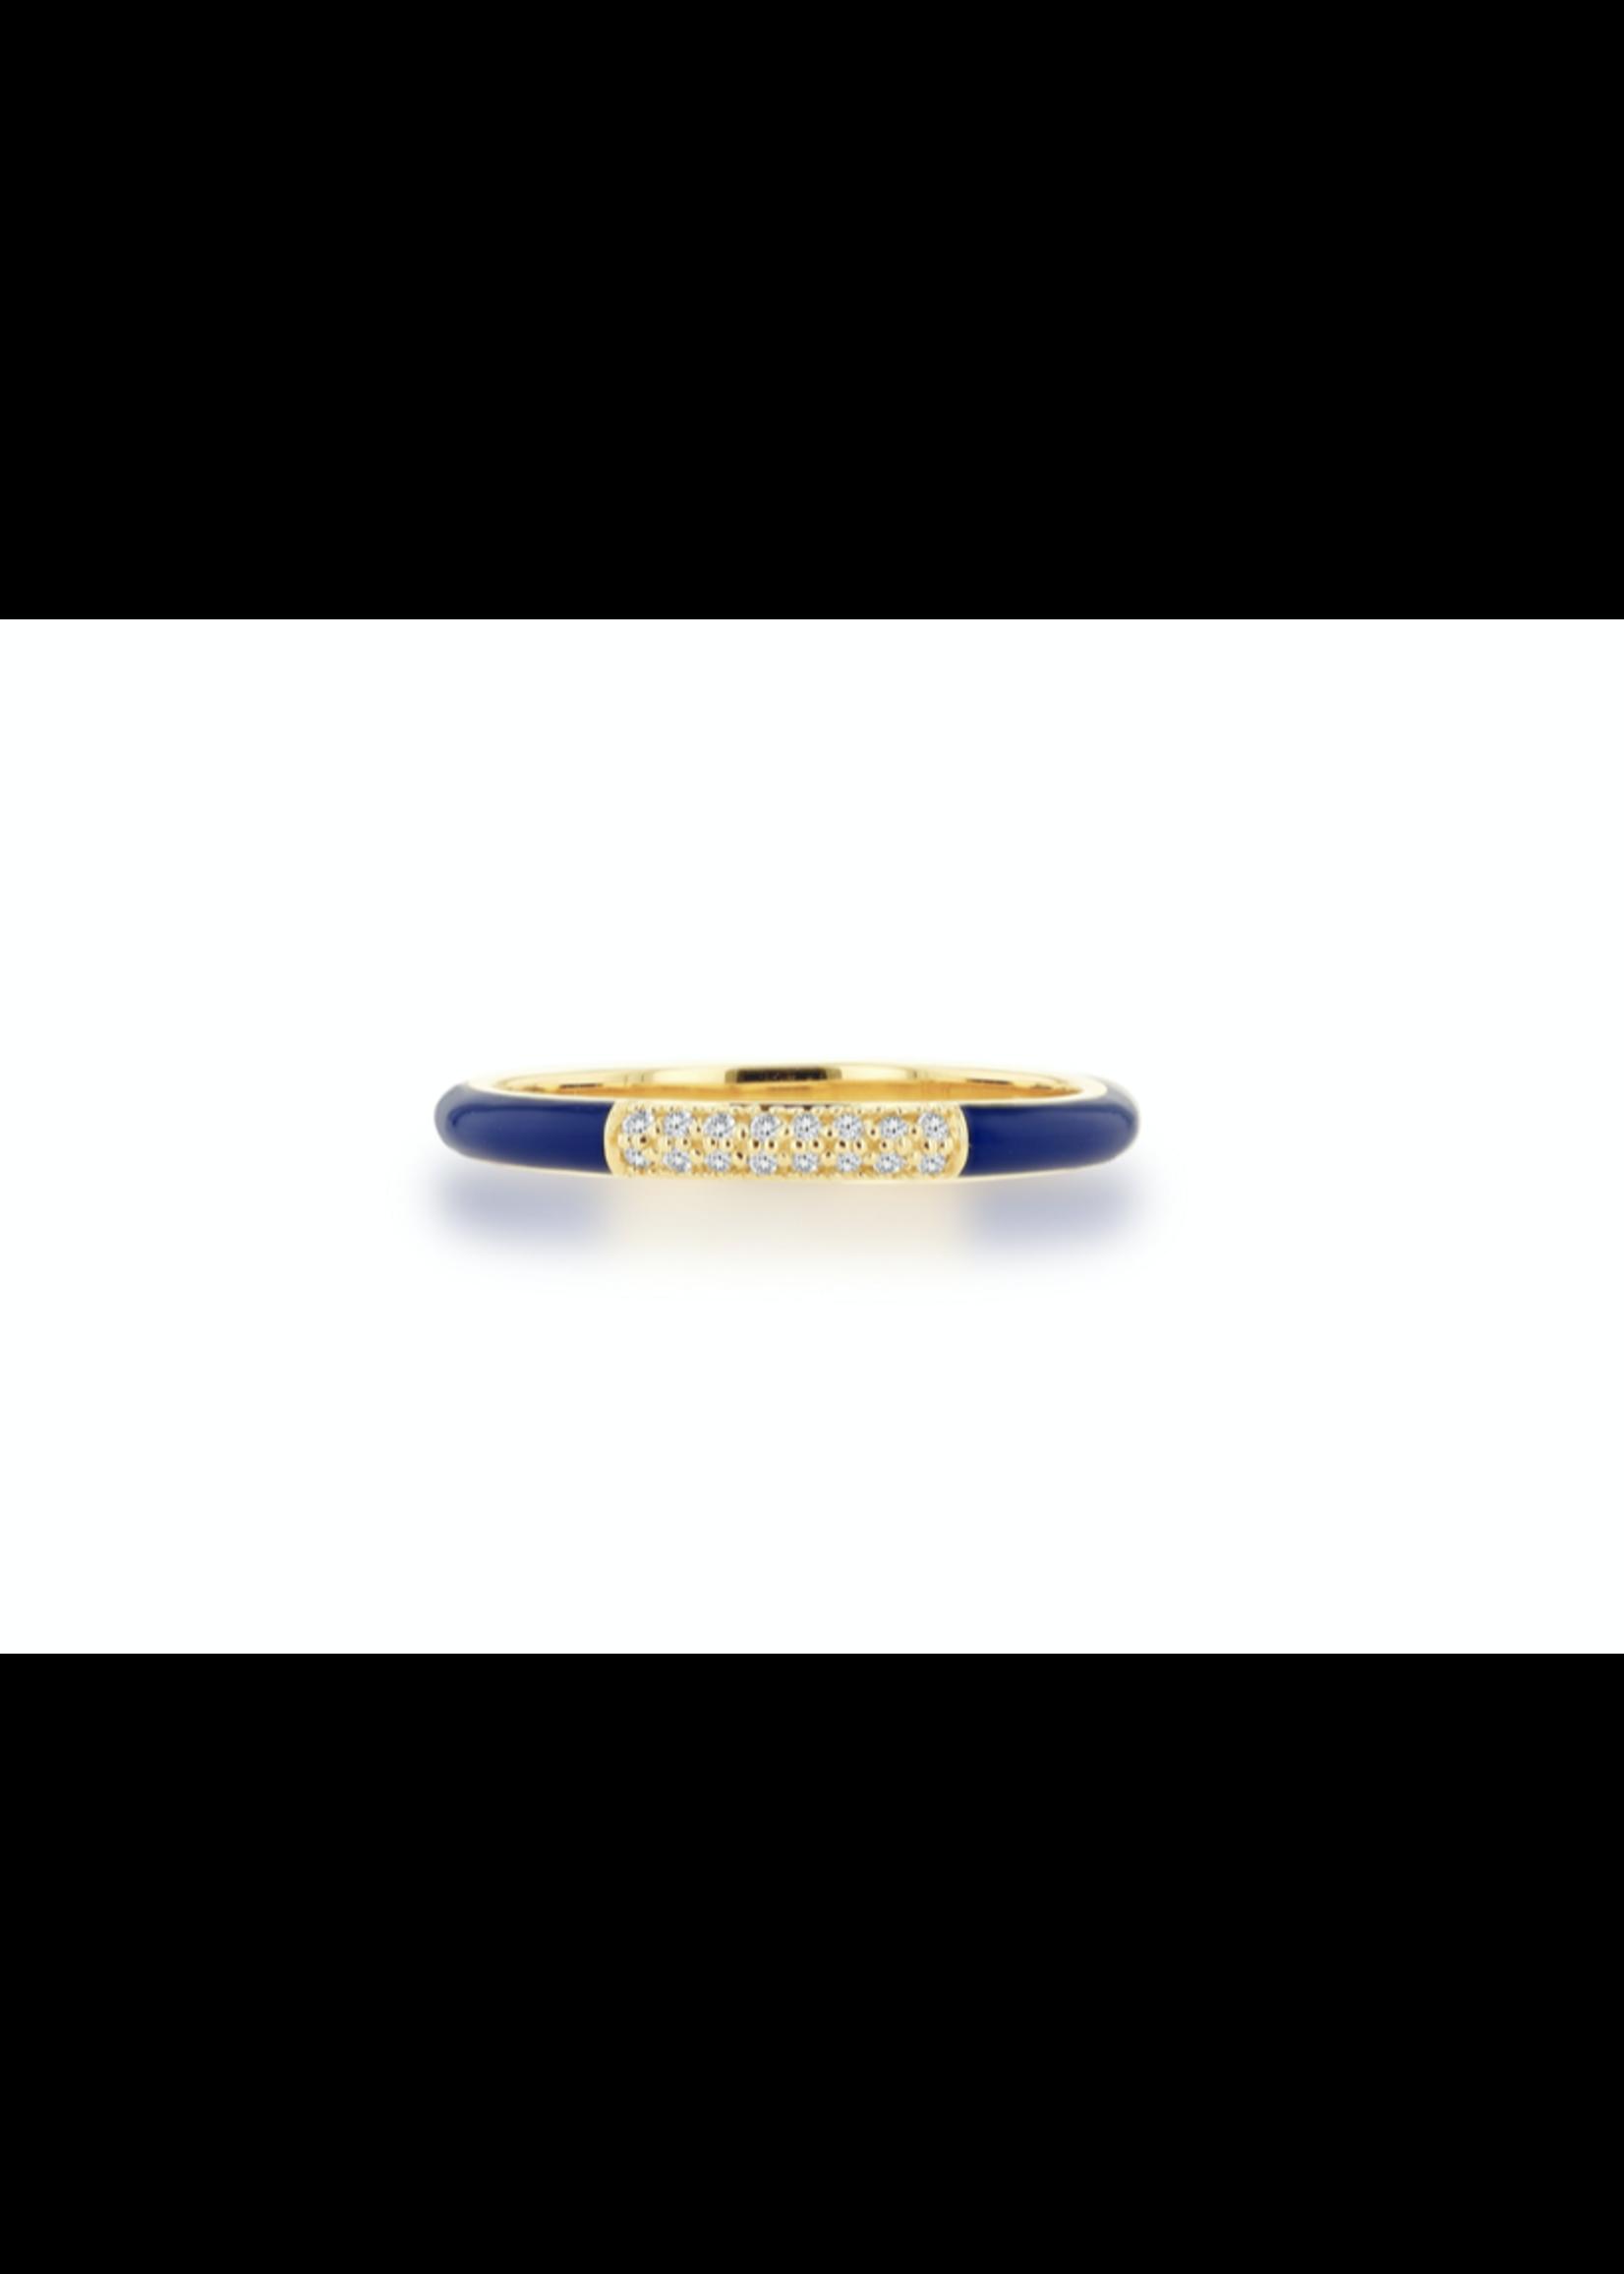 Rachel Reid Navy Enamel & Pave Diamond Band Ring